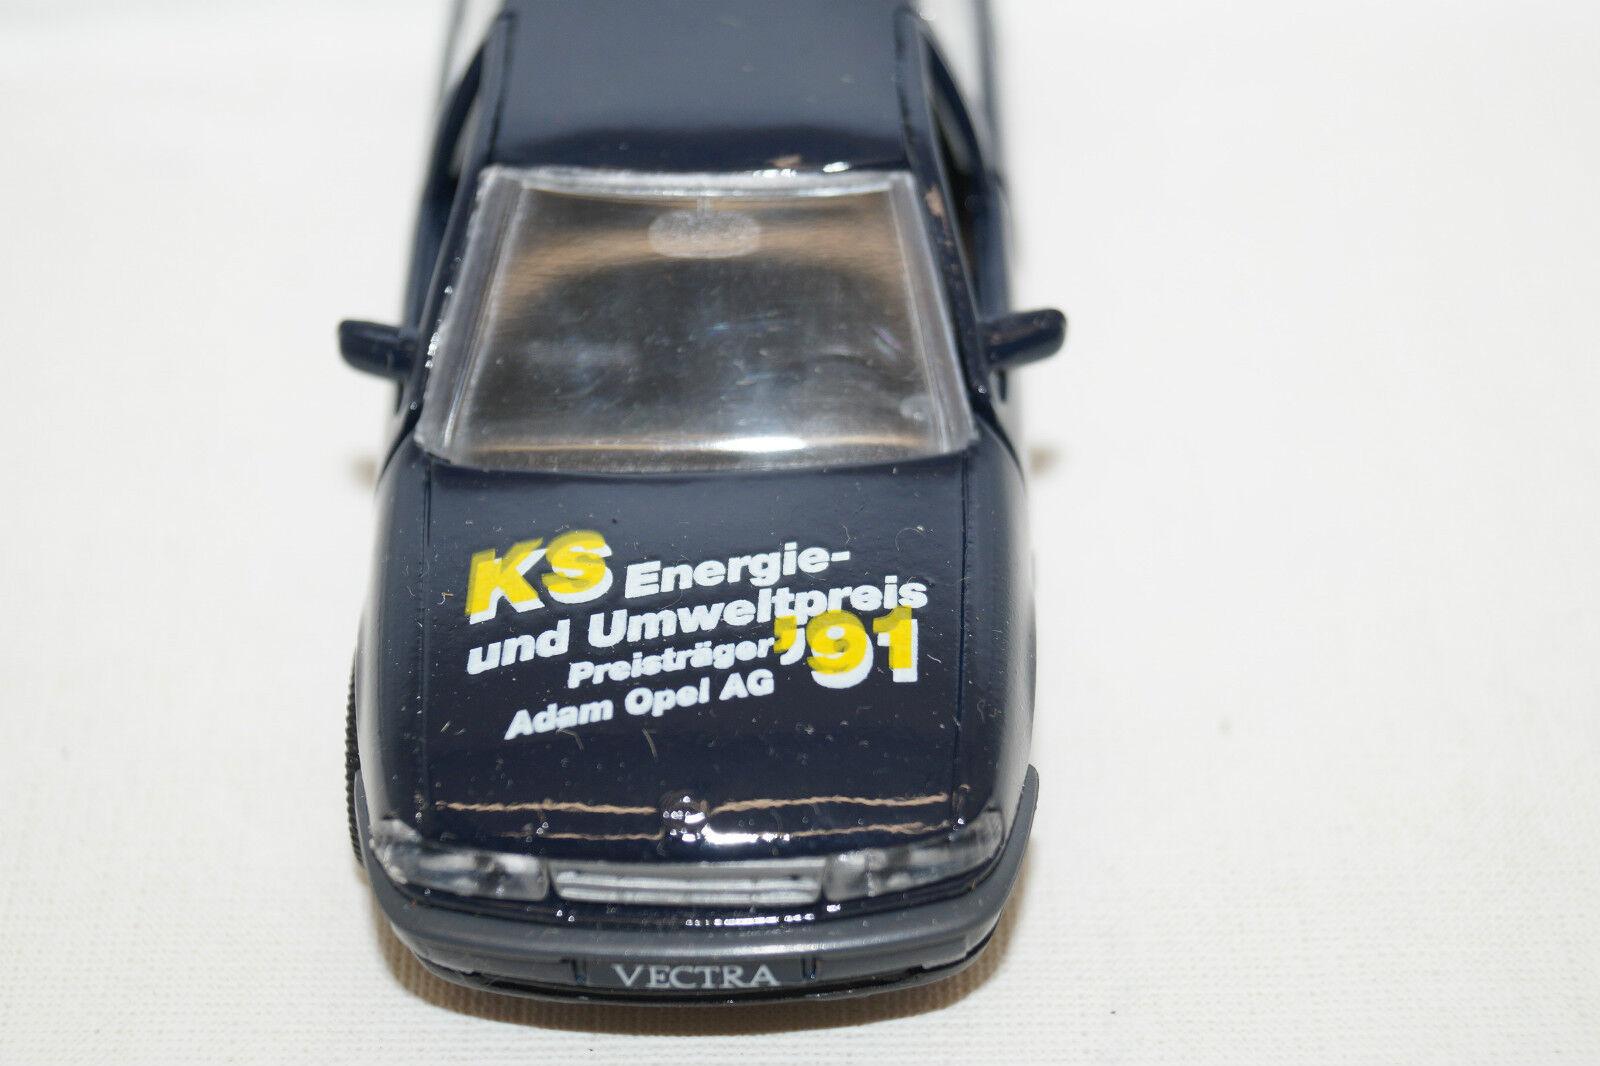 GAMA OPEL VECTRA A Sondermodell KS Energie und Umweltpreis 1991  1 43  | Neuankömmling